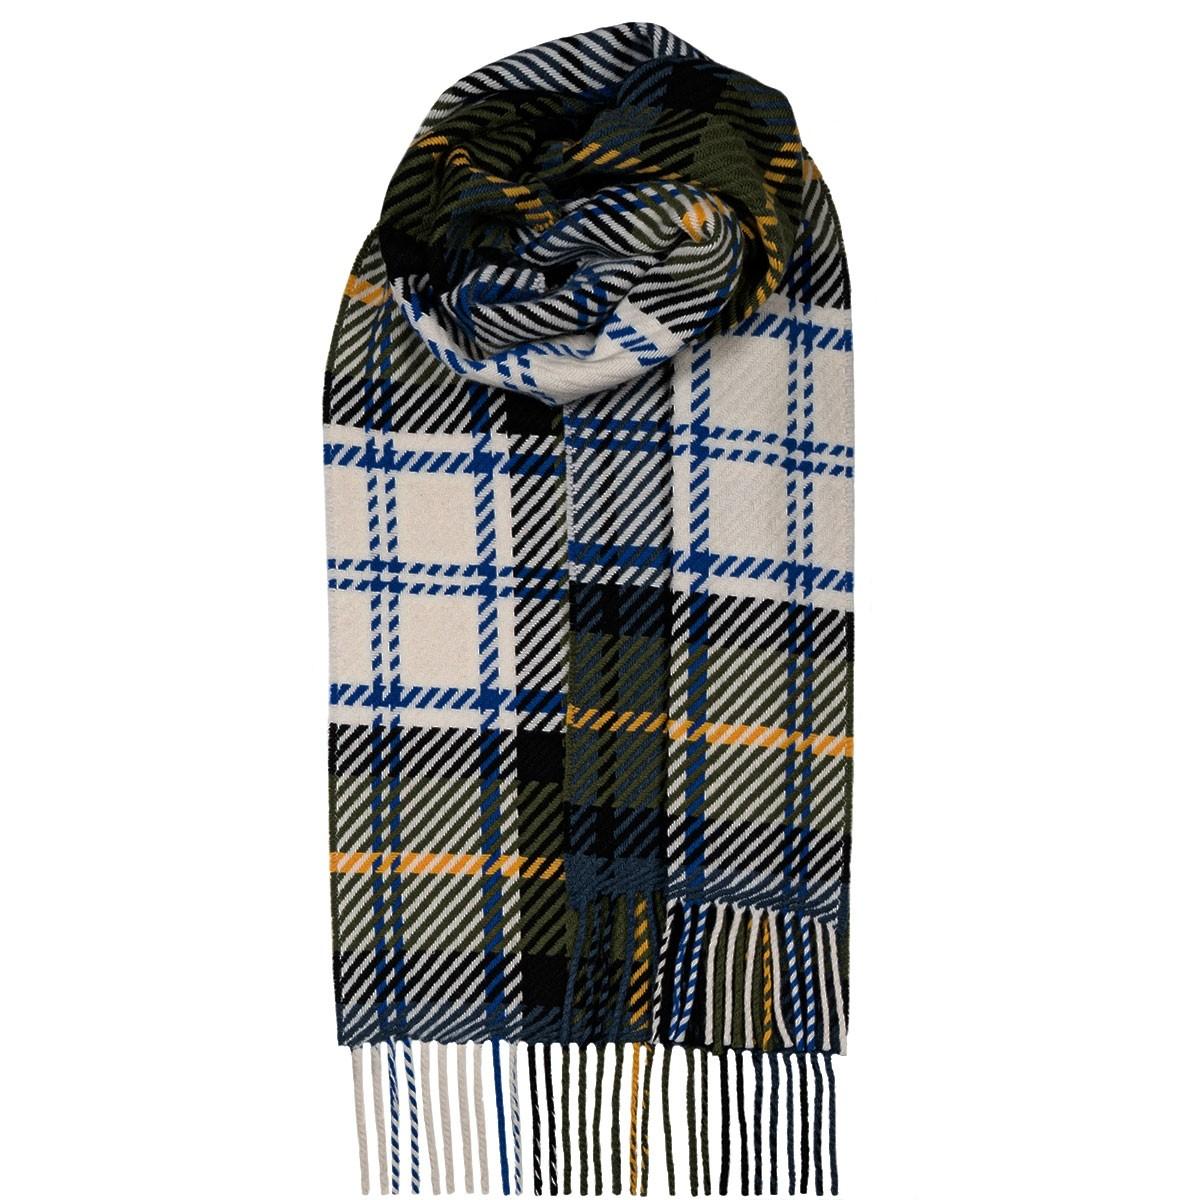 Ellis Gordon Dress Ancient  Luxury Superfine Wool Scarf